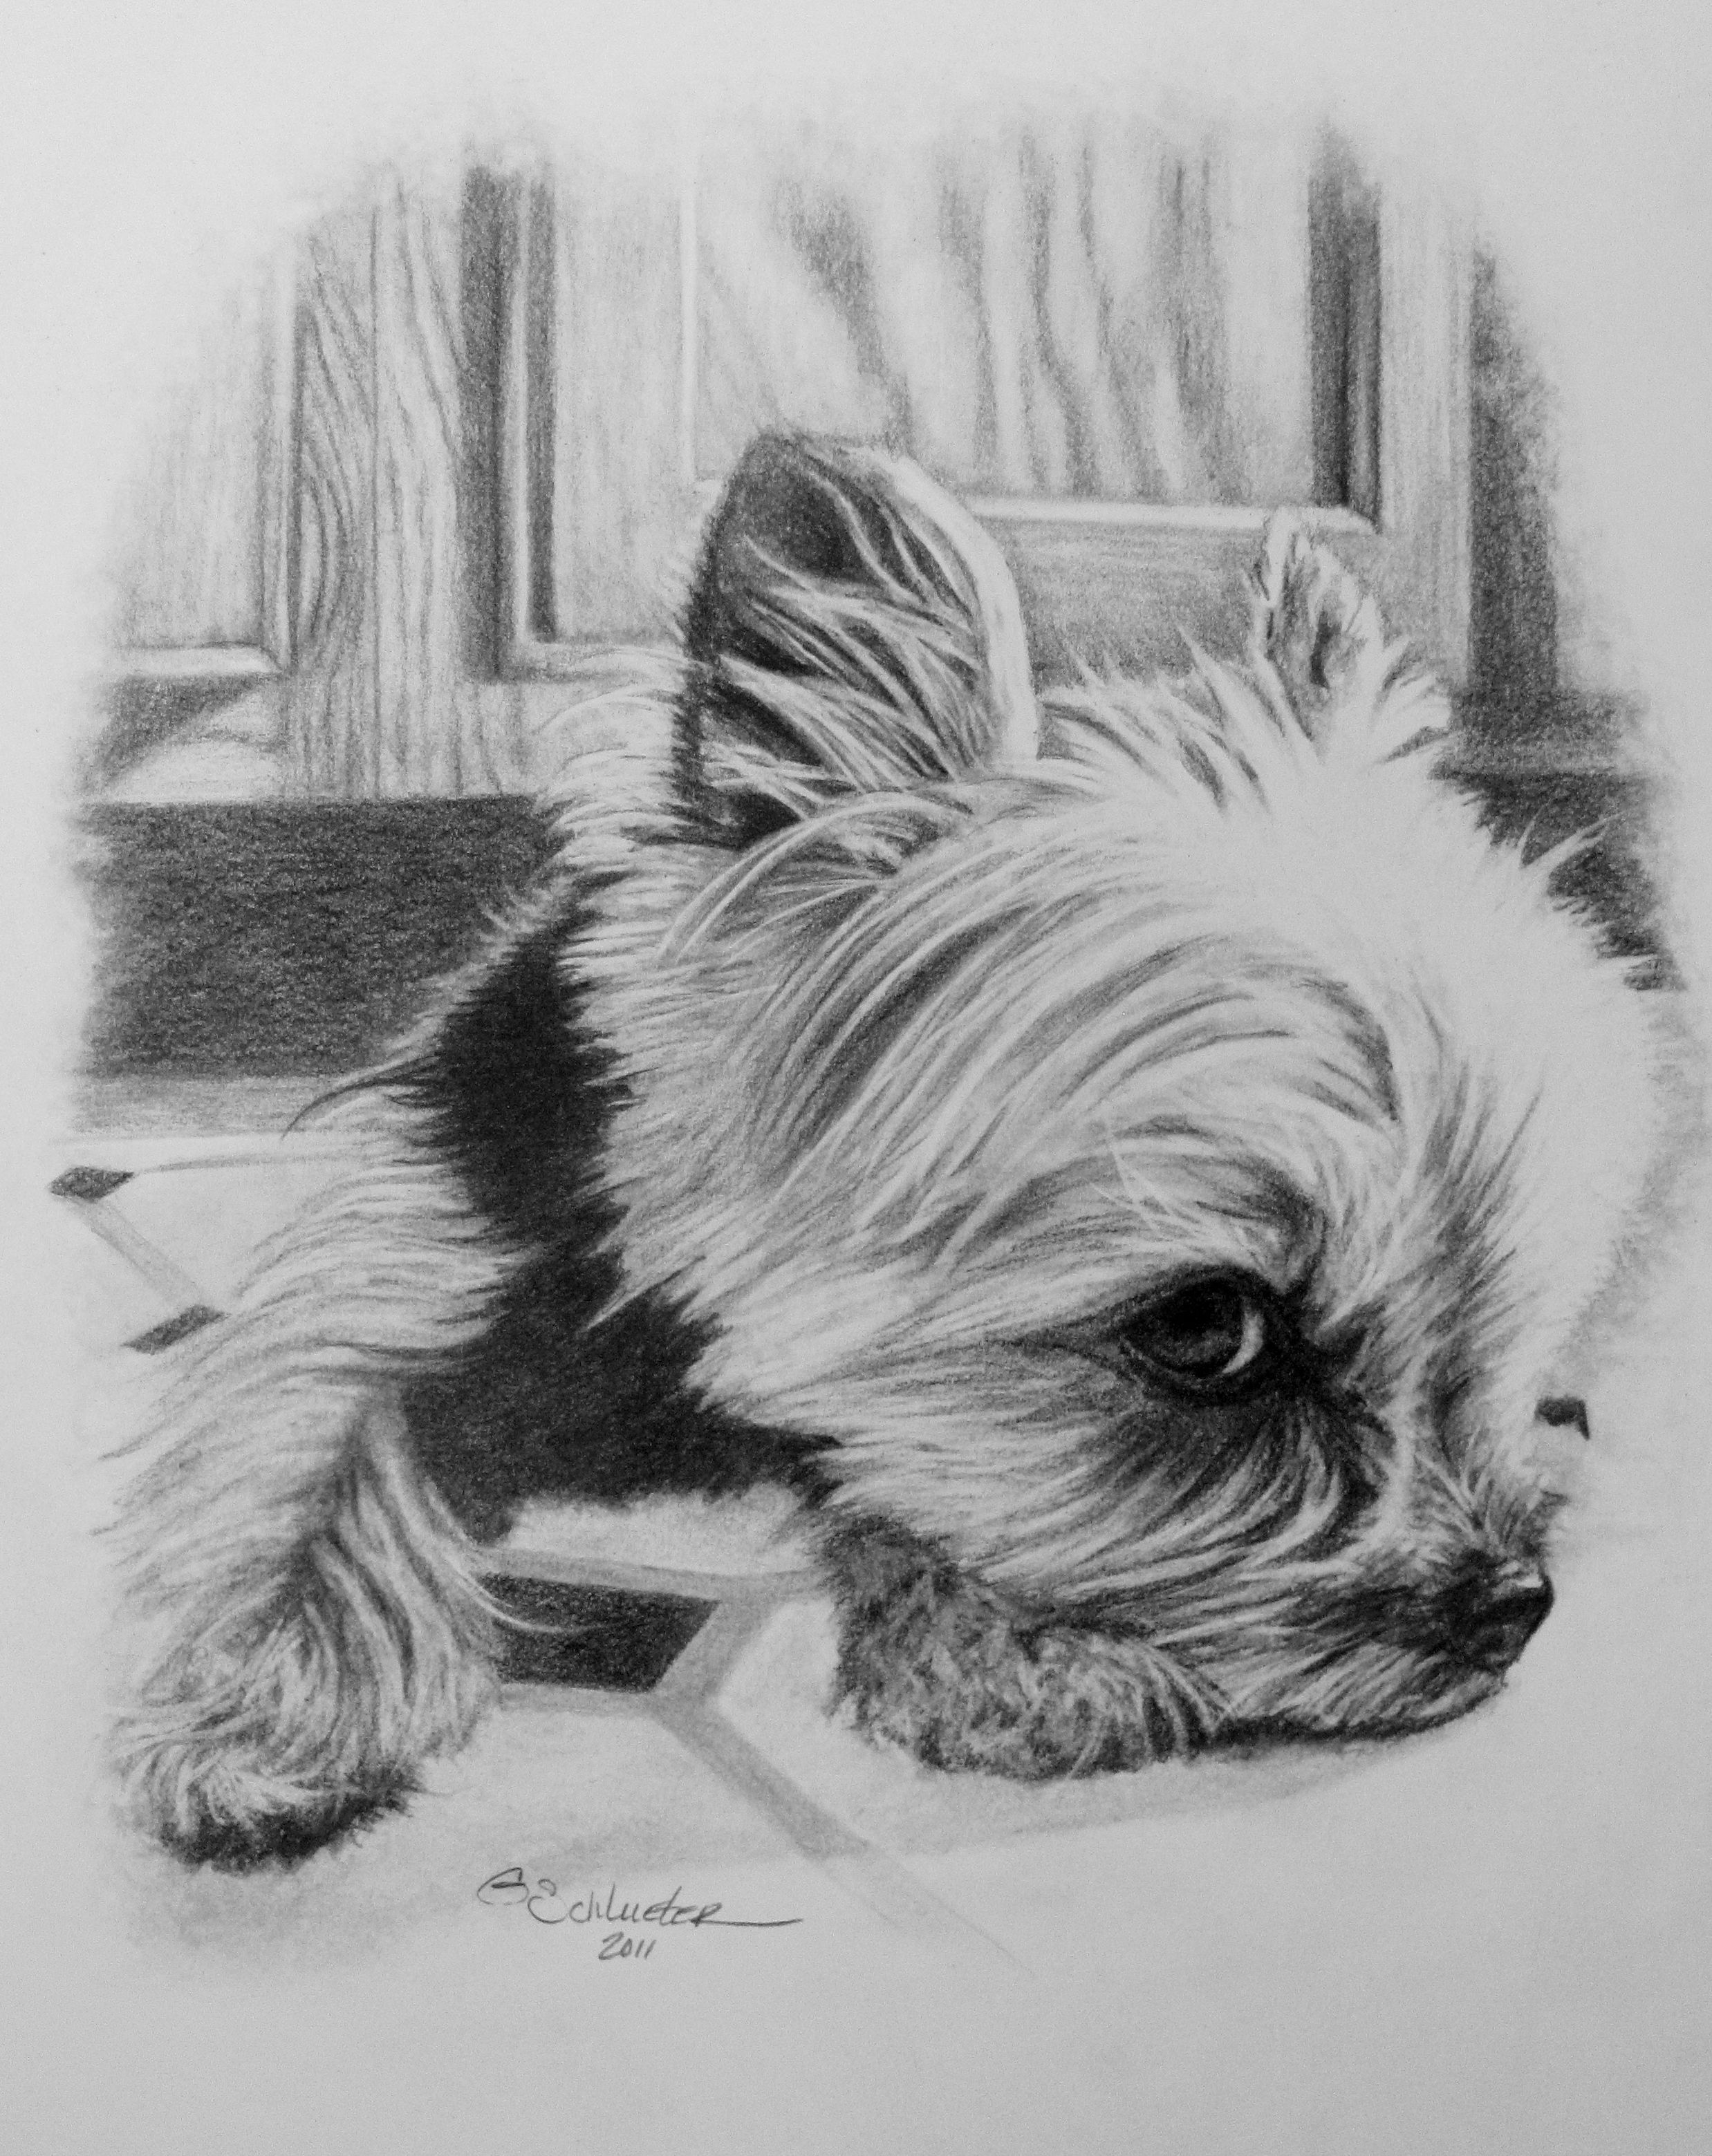 The Little Yorkie Sketch Are You Looking For A Special Unique Gift For A Pet Lover Give T Dibujos Faciles De Perros Dibujos De Animales Dibujos De Perros